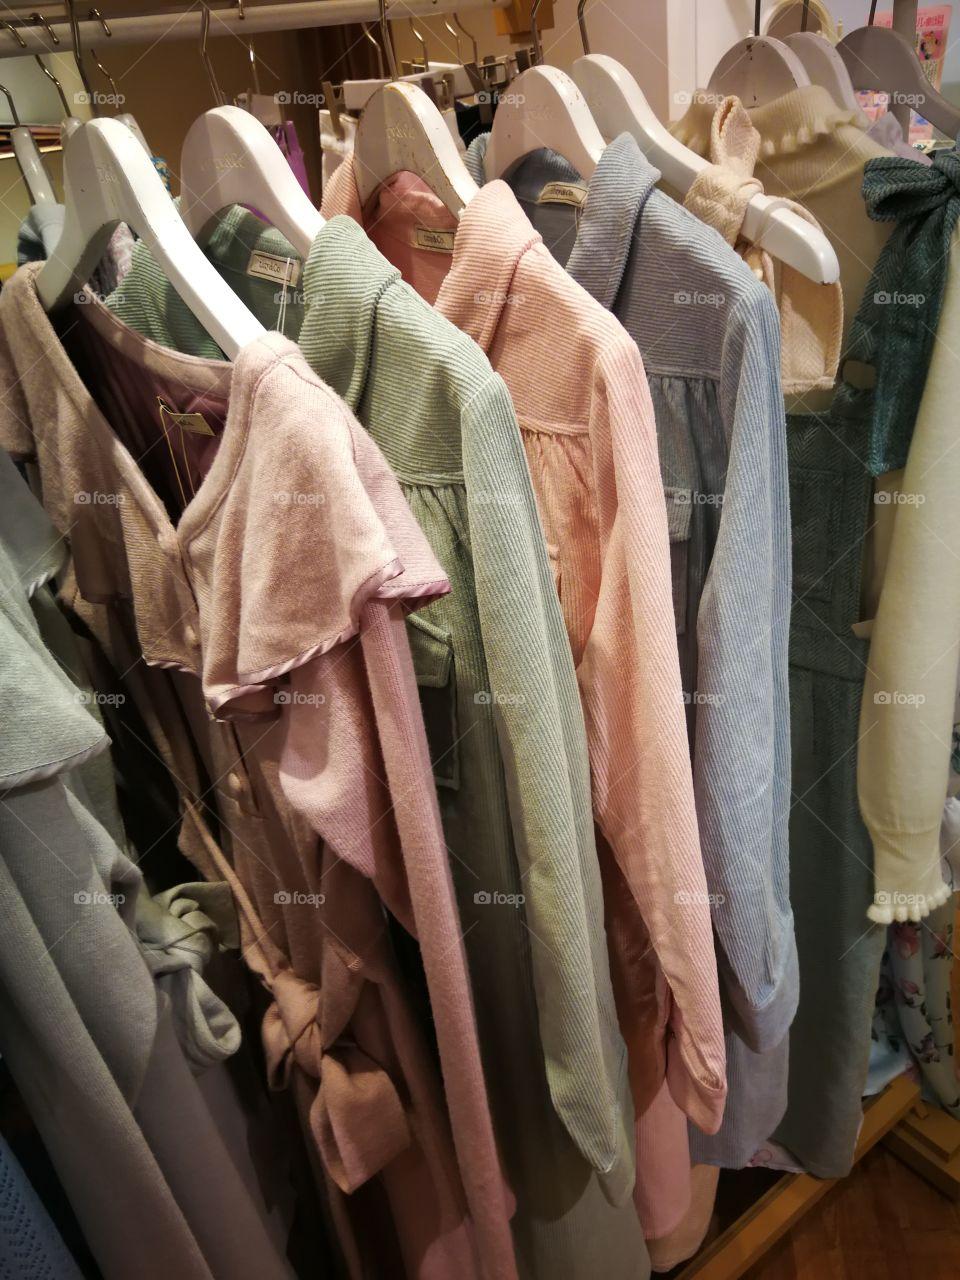 Browsing the clothing racks